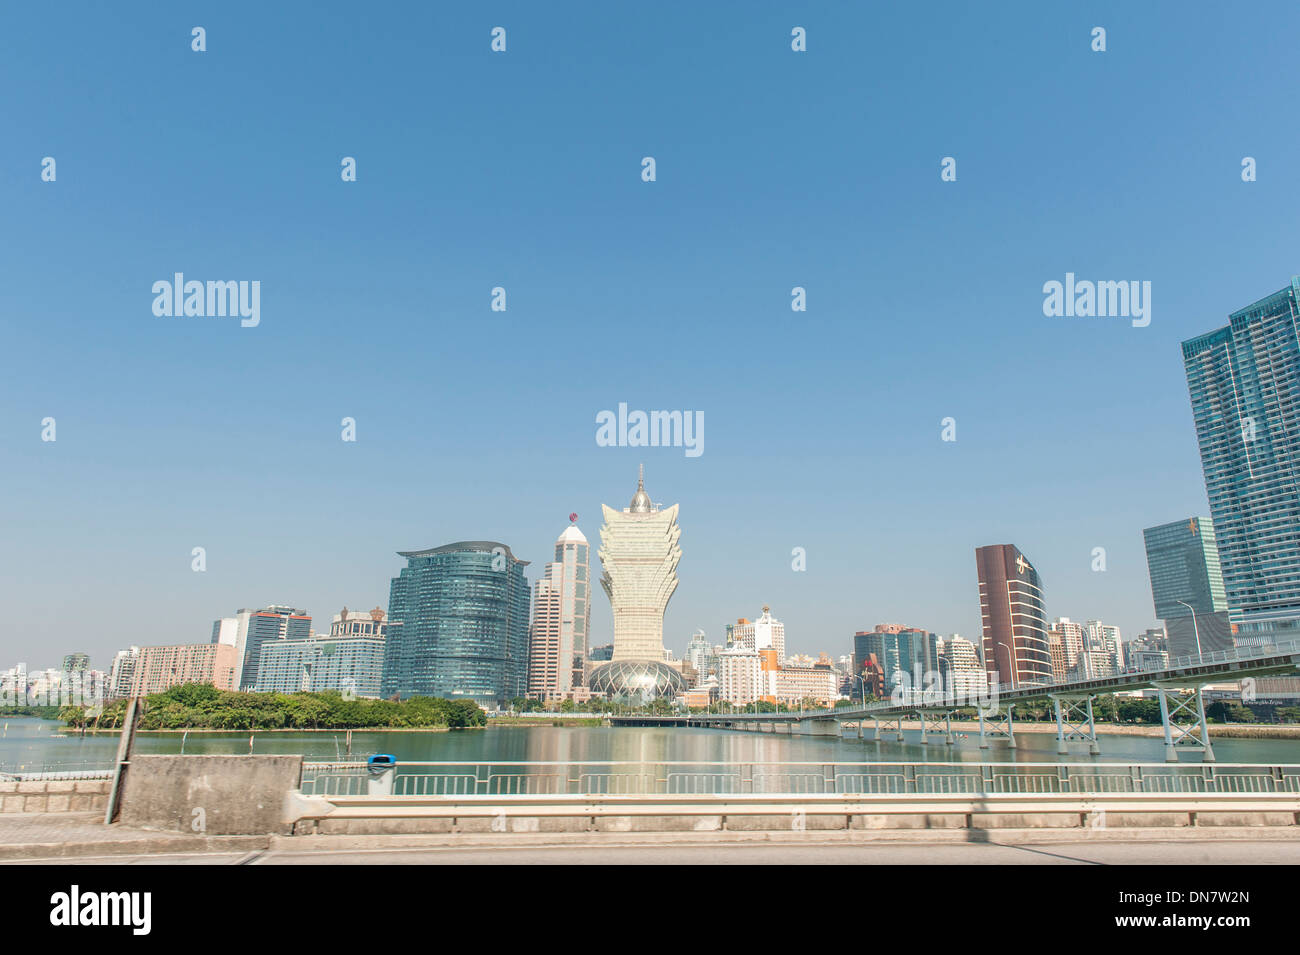 The casinos at Cotai strip, with the landmark buidling of Grand Lisboa at Macao (Macau), SAR of China - Stock Image